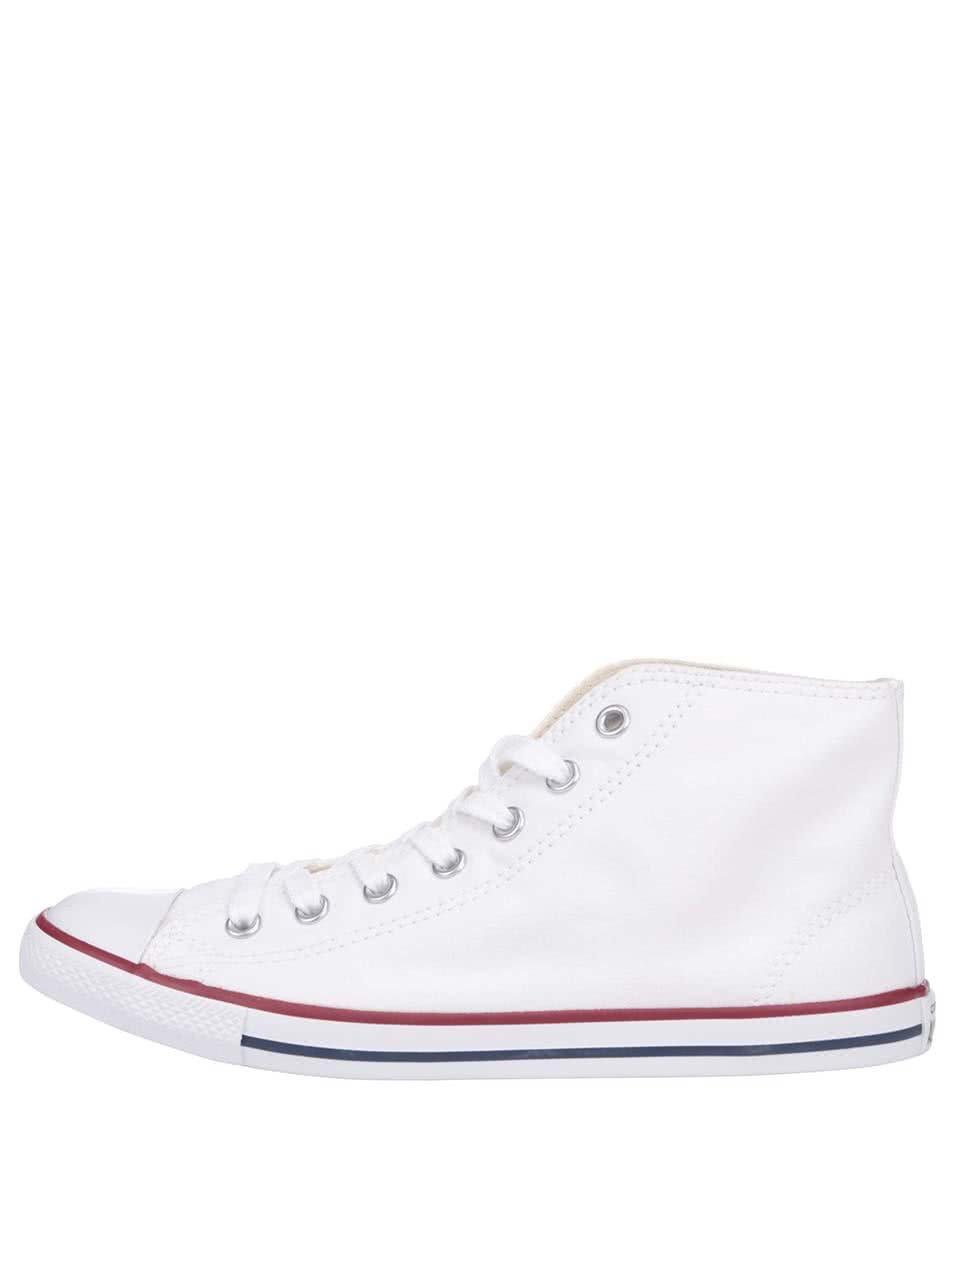 012a91a7317f Biele dámske členkové tenisky Converse Chuck Taylor All Star Dainty ...